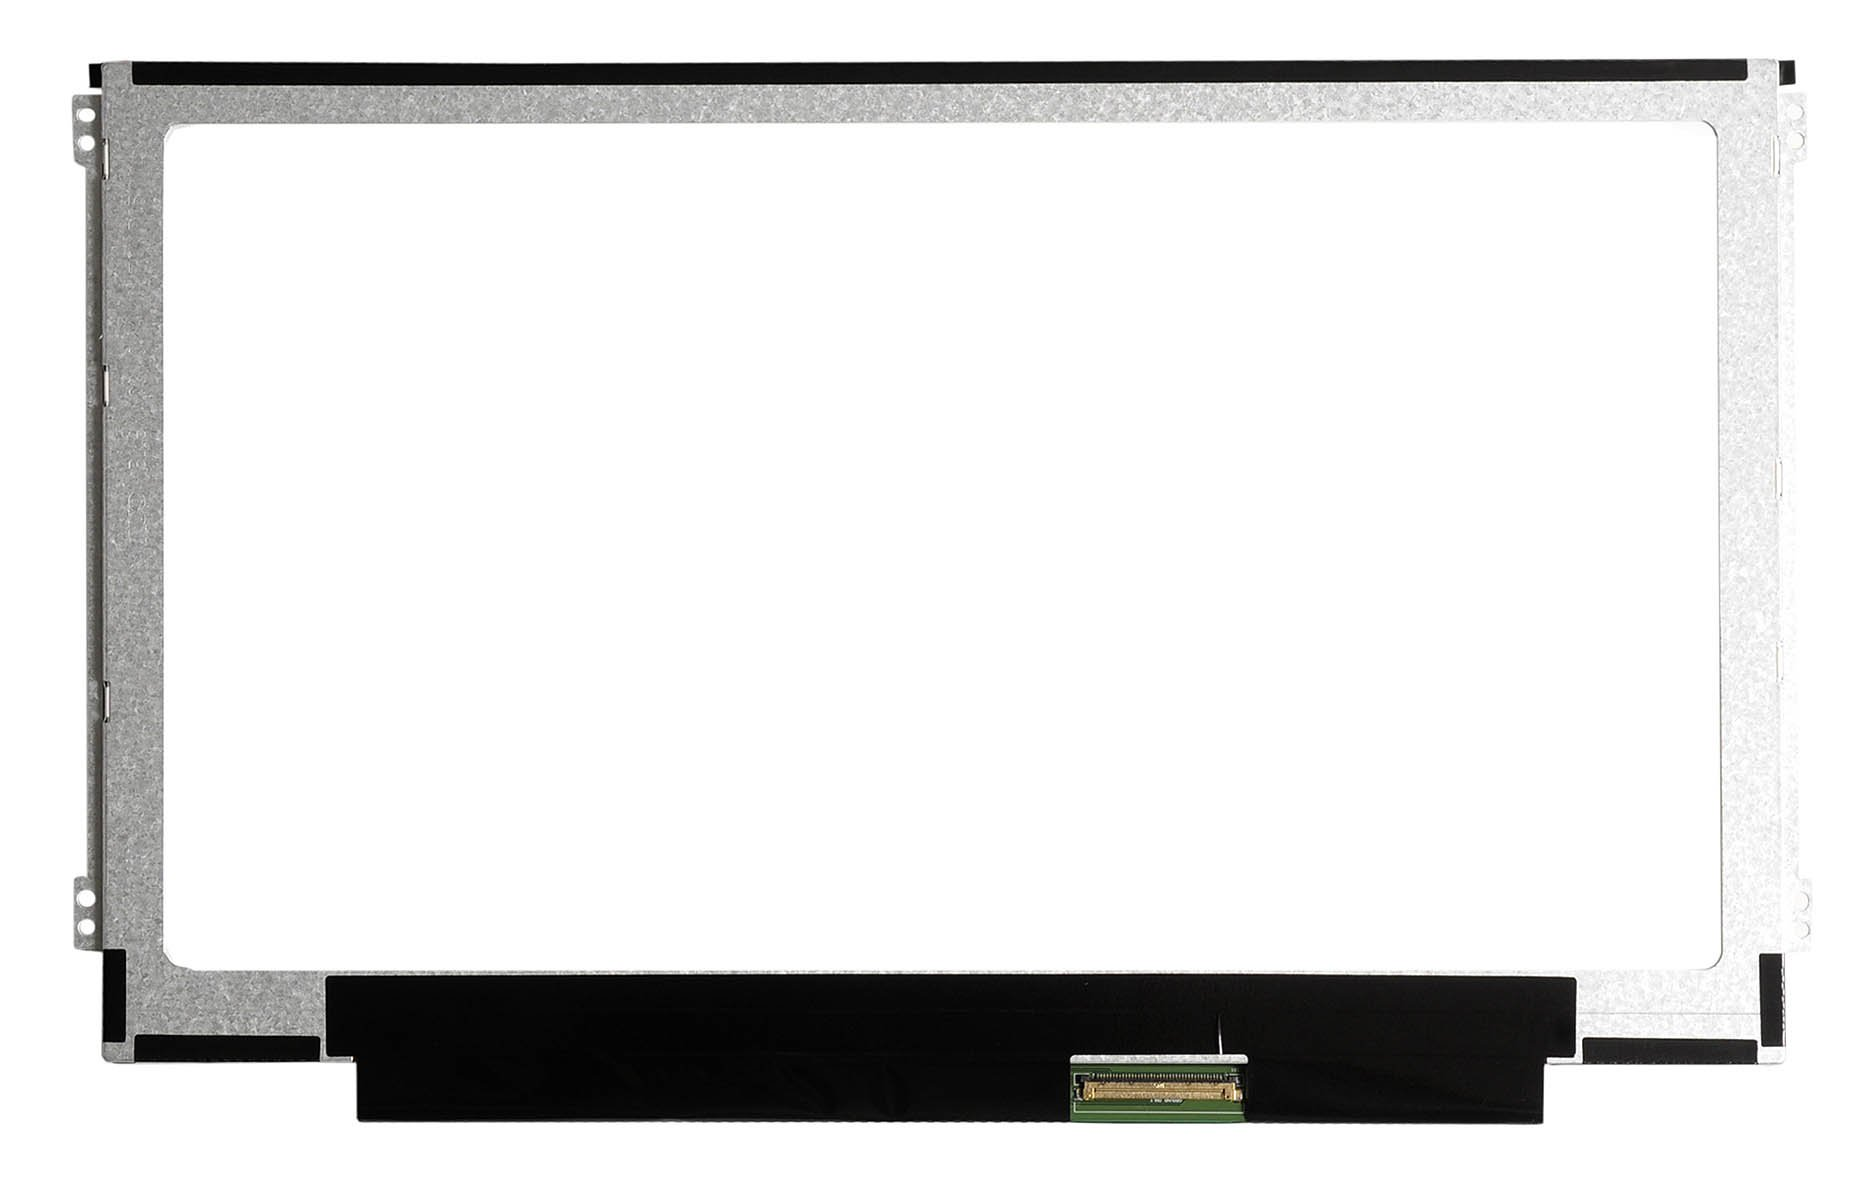 "Dell INSPIRON 11 3000 LCD LED 11.6"" Screen Display Panel WXGA HD"